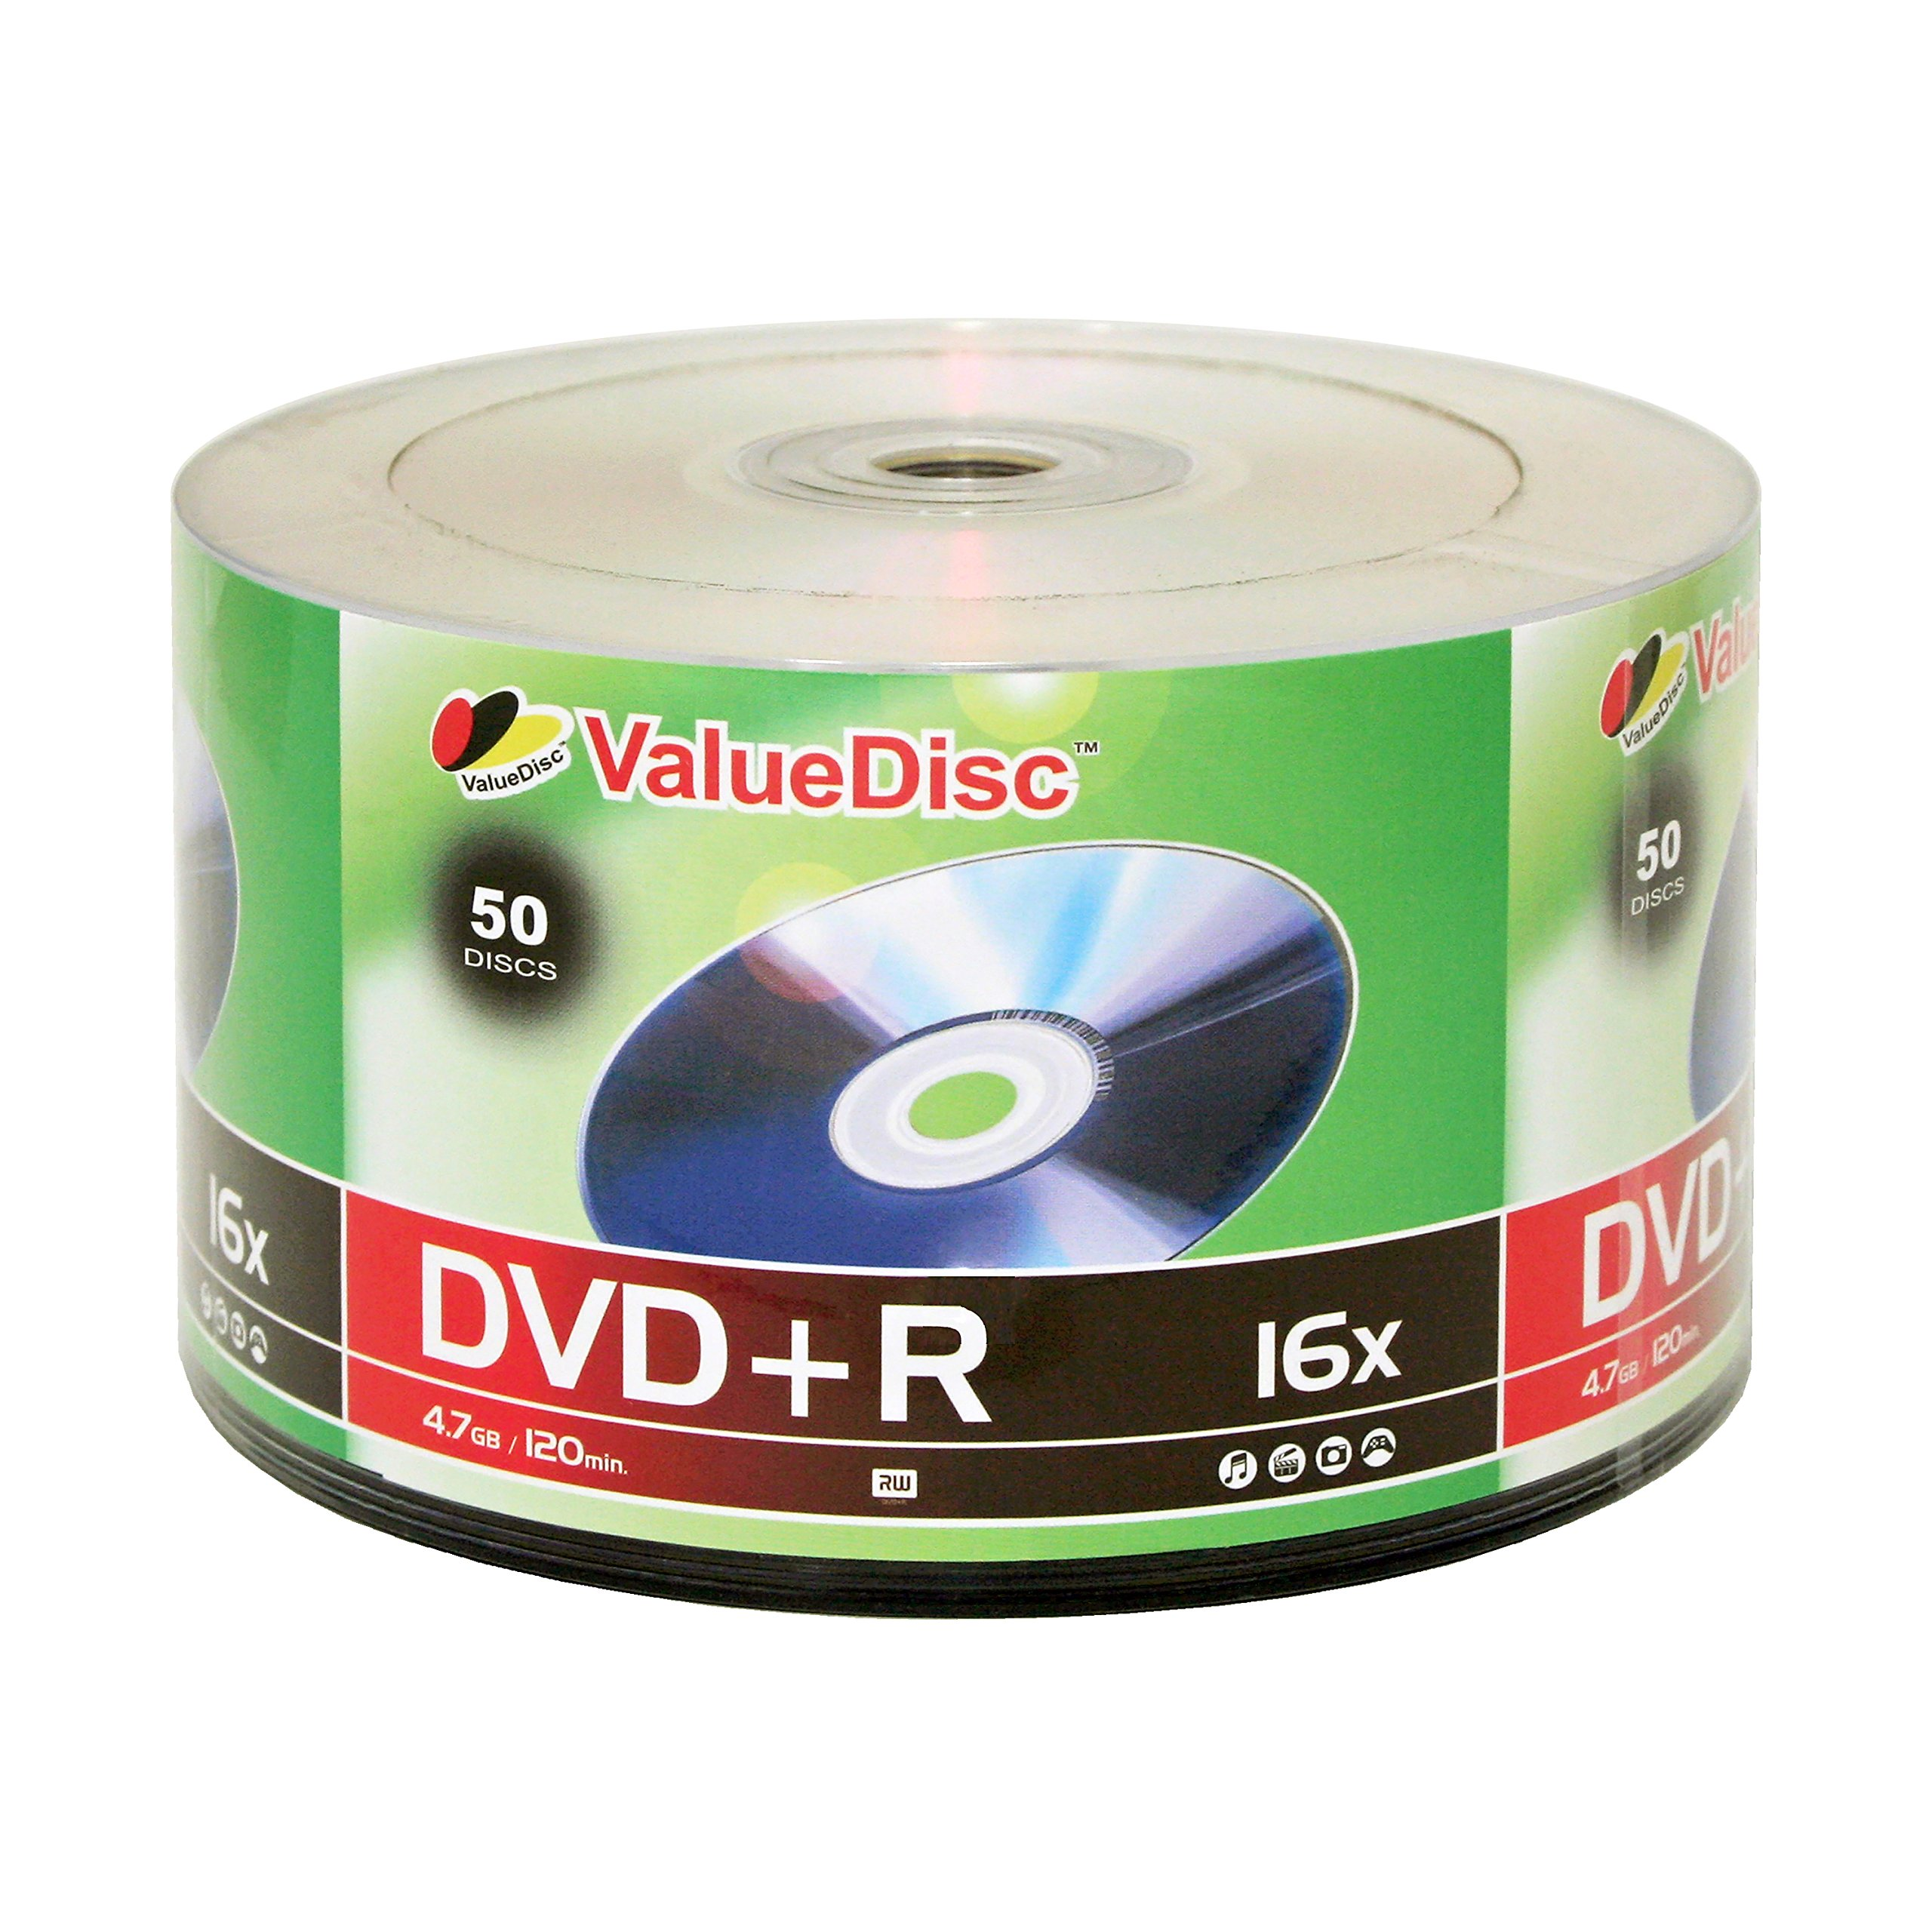 ValueDisc,DVD+R 16x 4.7GB/120 Minute Disc 50-Pack